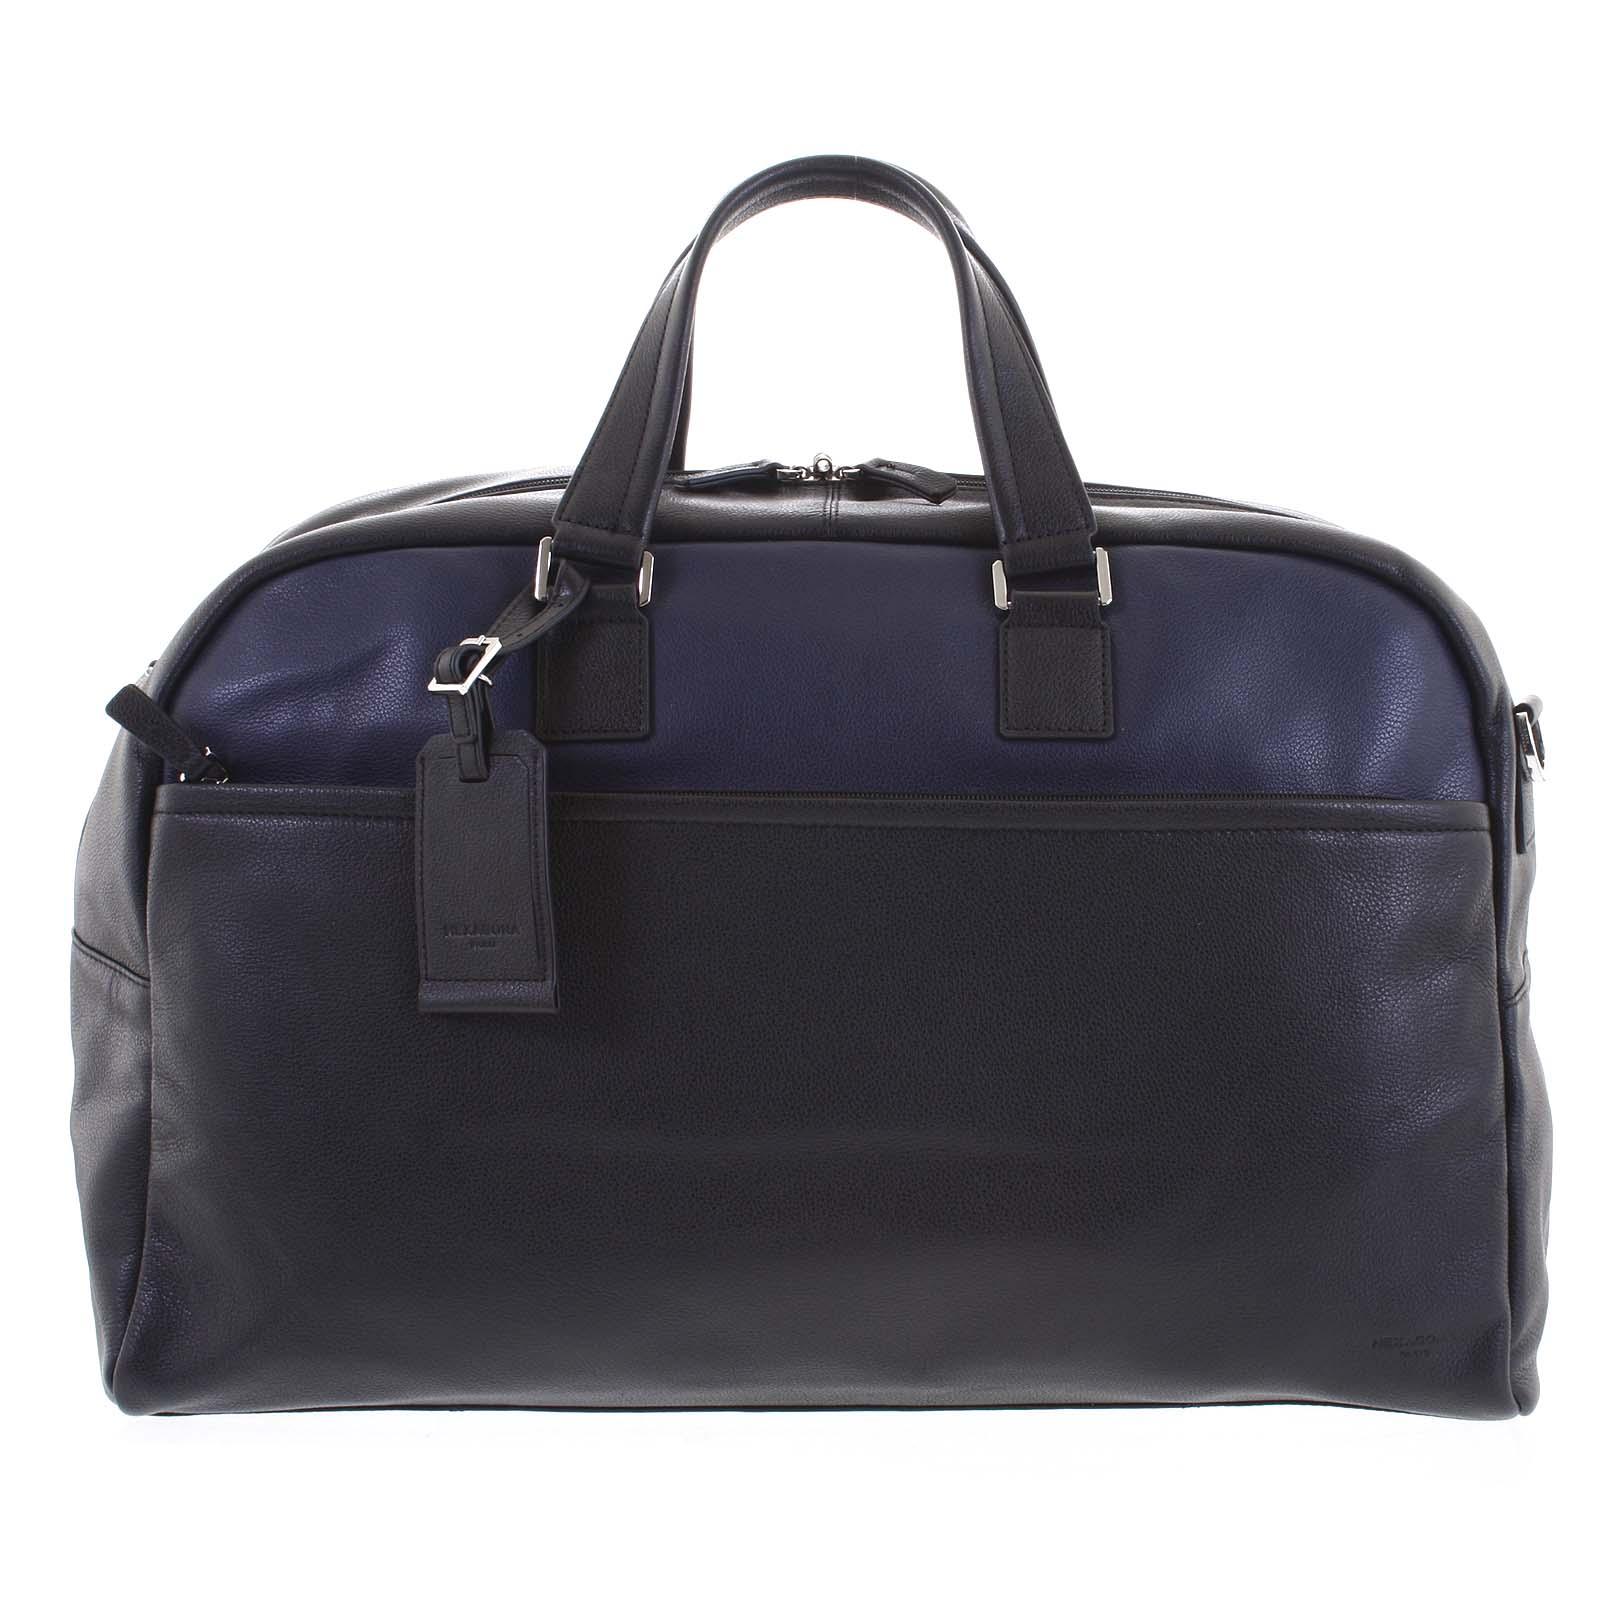 Cestovní kožená taška černo modrá - Hexagona Everyday modrá